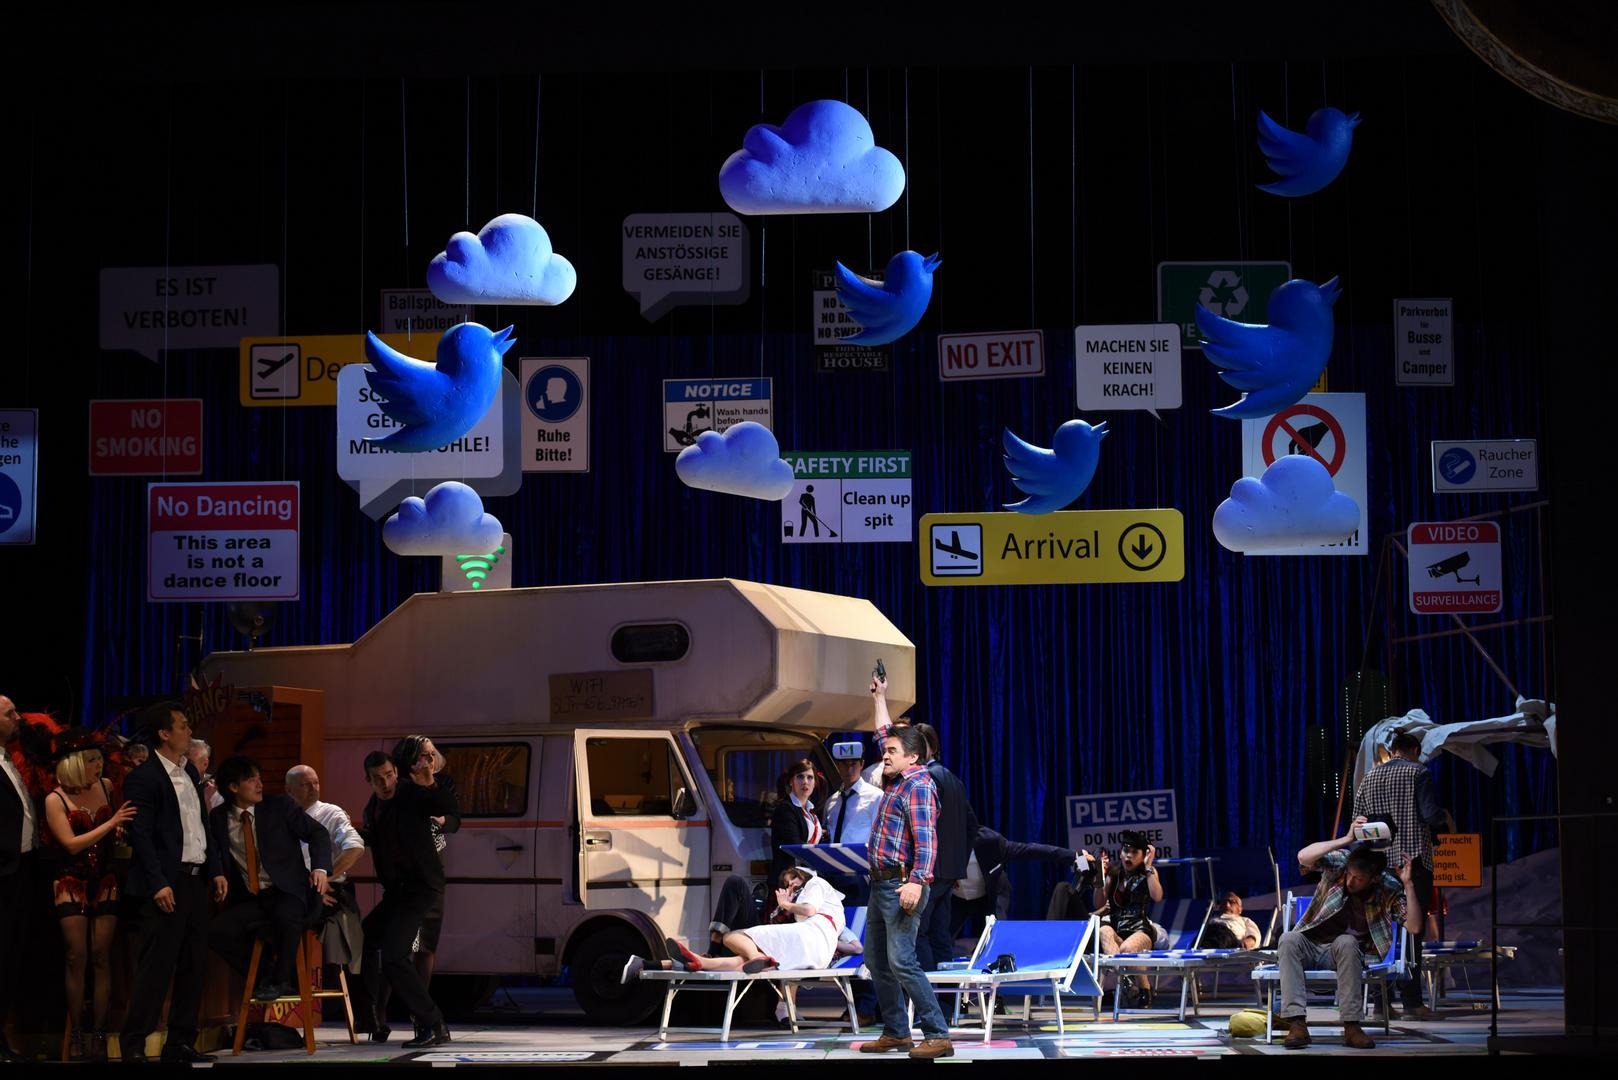 Mahagonny-Opera-by-Kurt-Weill-Stage-director-Jacopo-Spirei-Salzburg-8